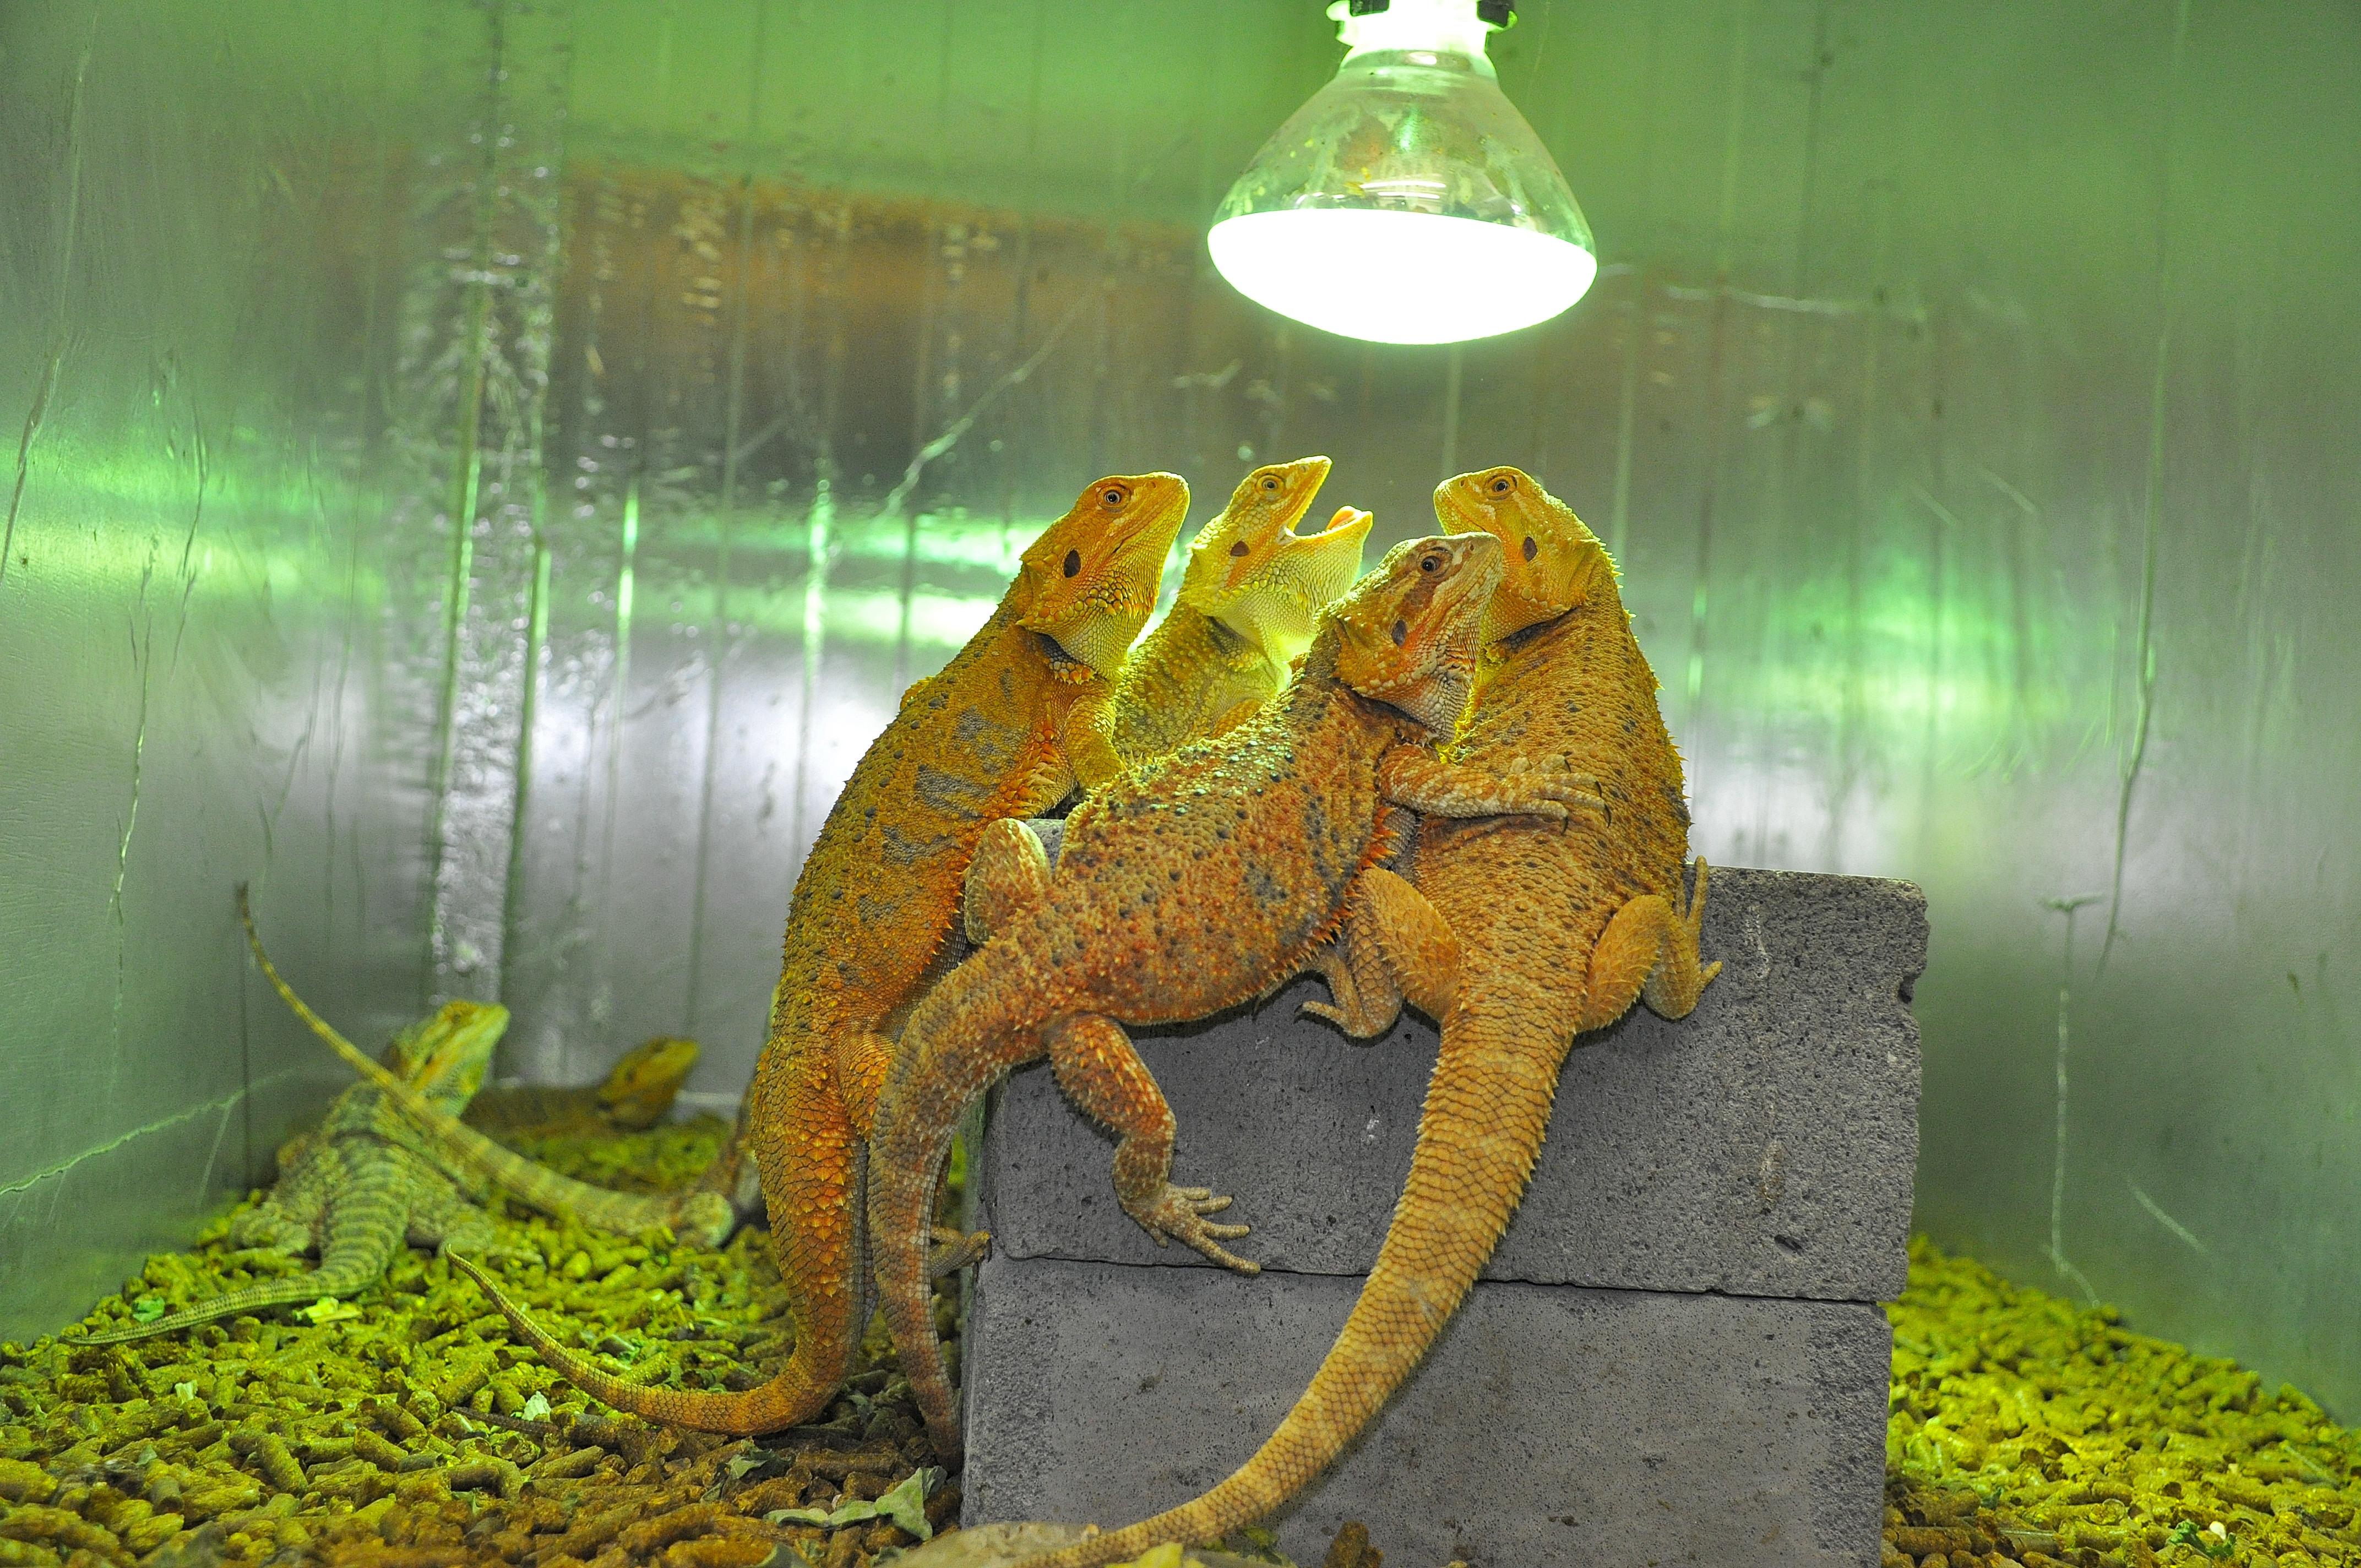 Mepal Reptile Farm